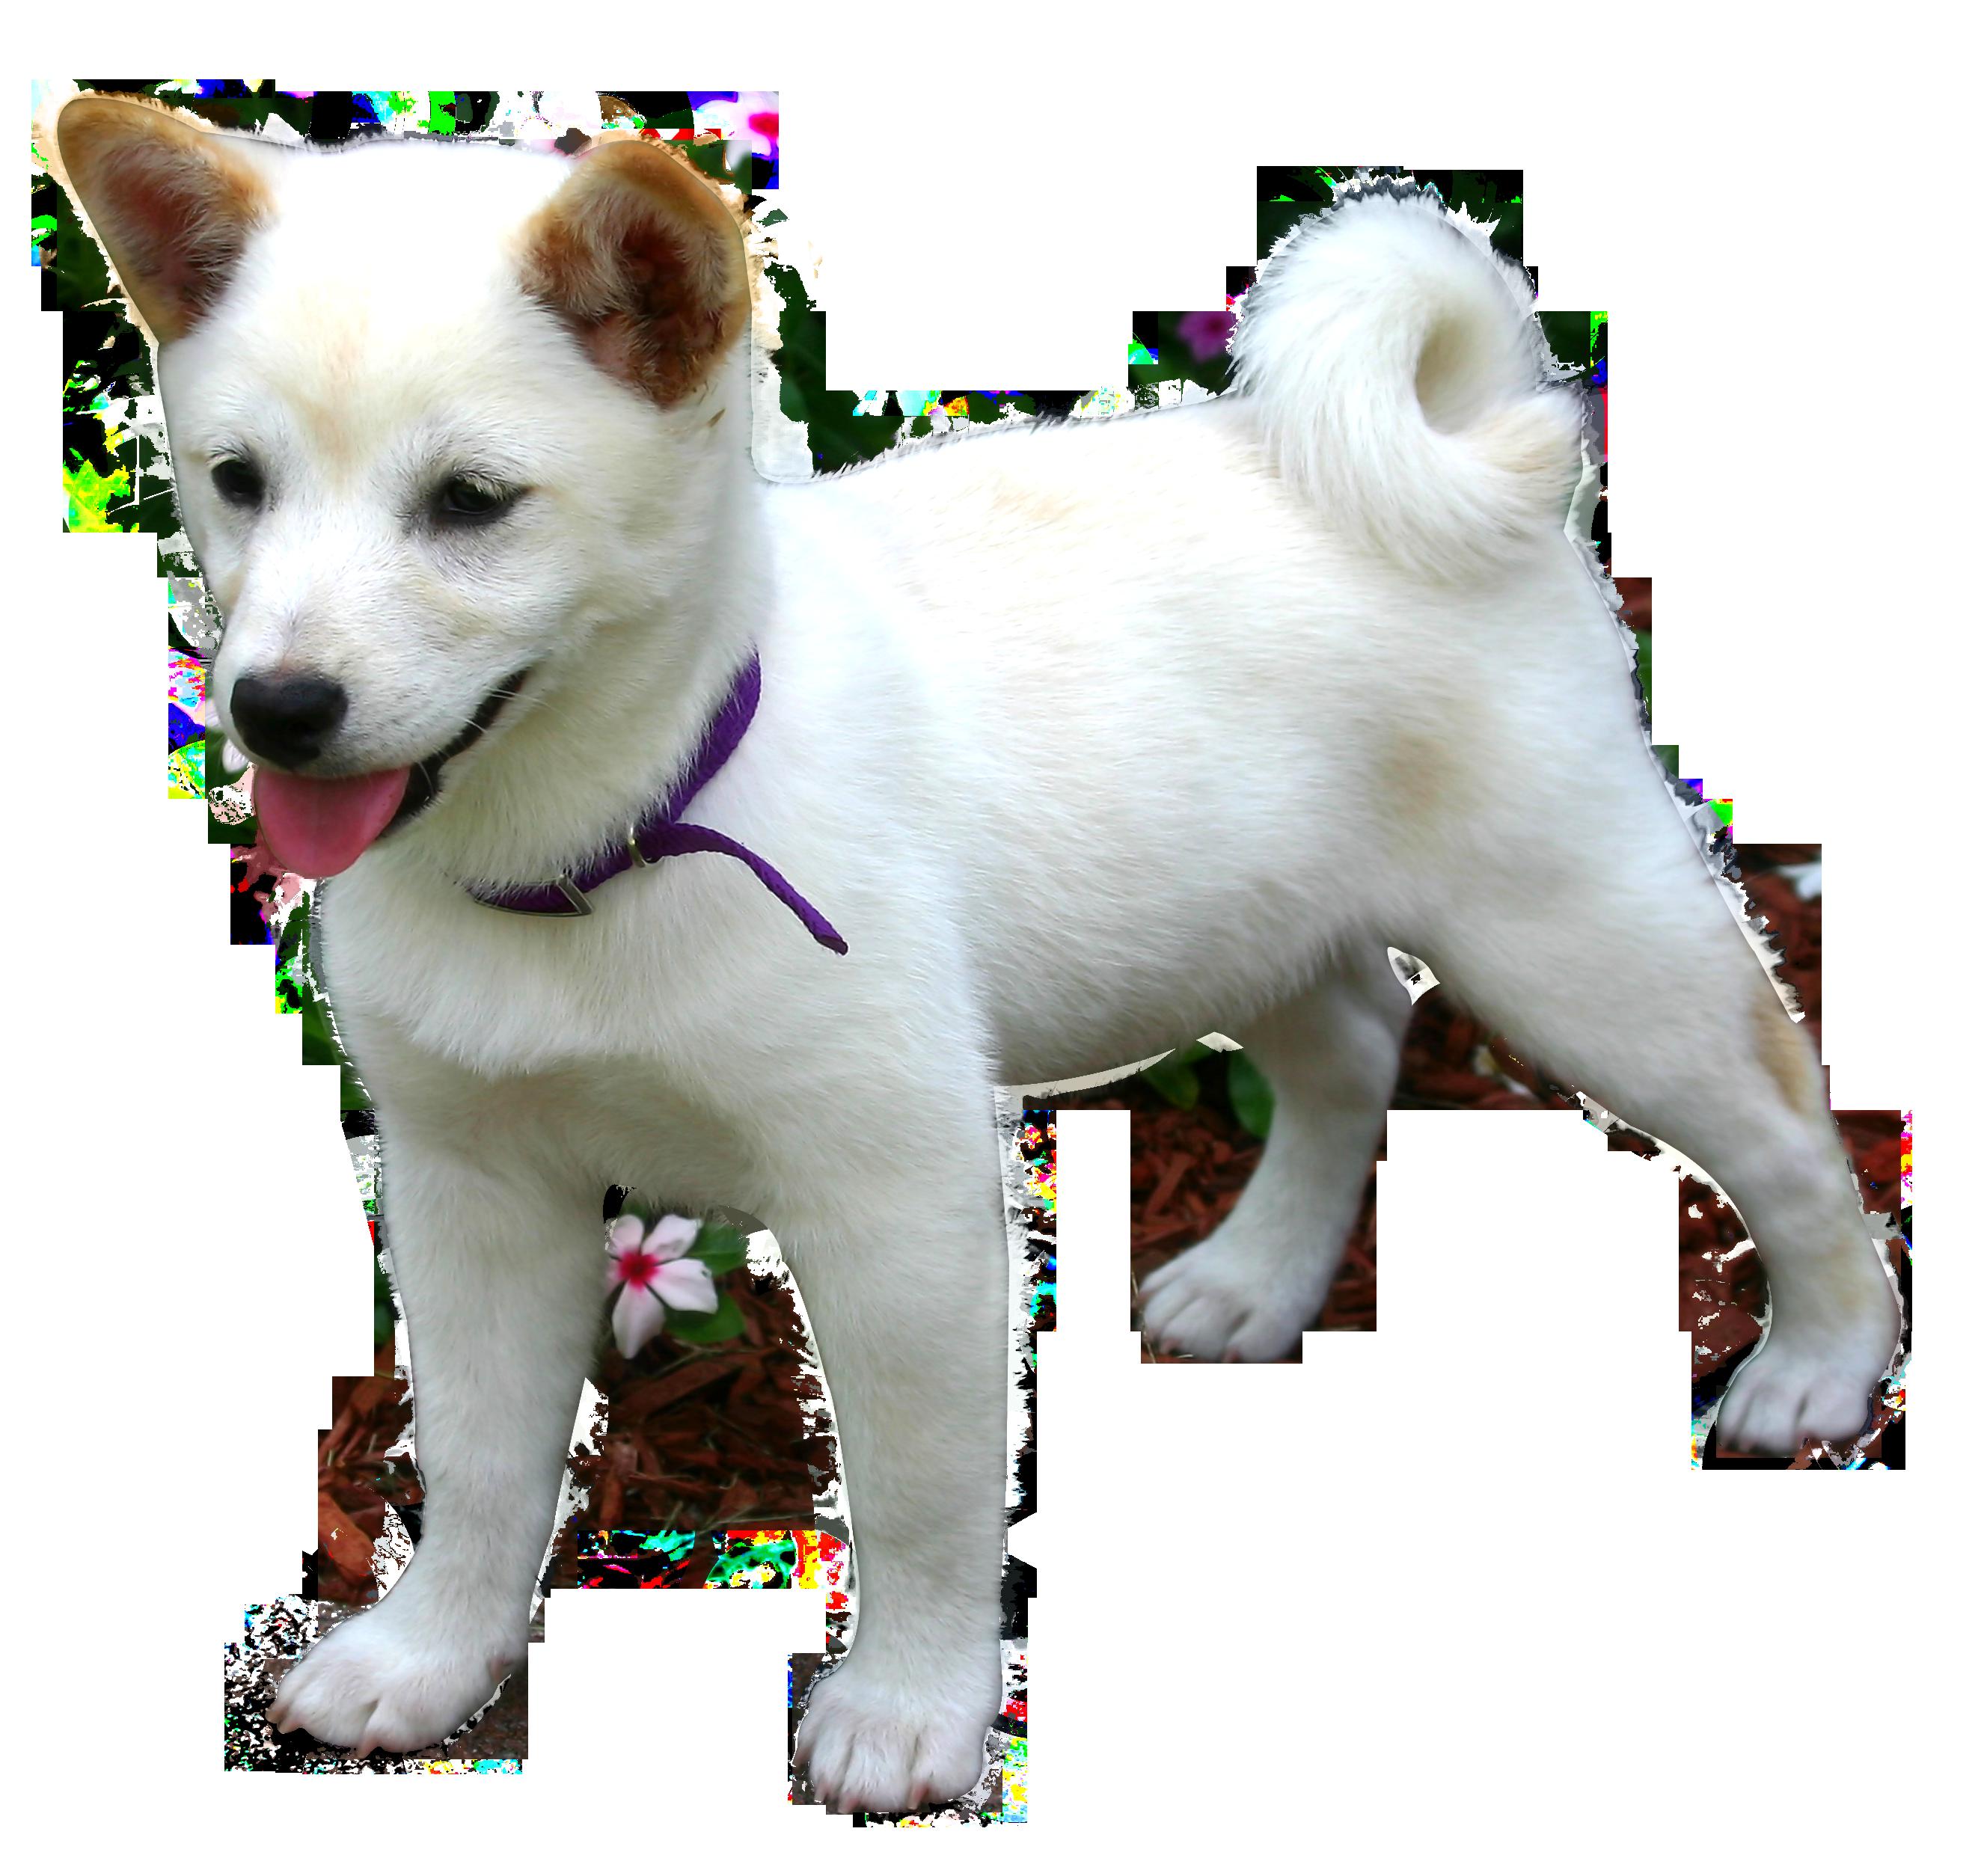 Dog PNG Image - PurePNG | Free transparent CC0 PNG Image ...